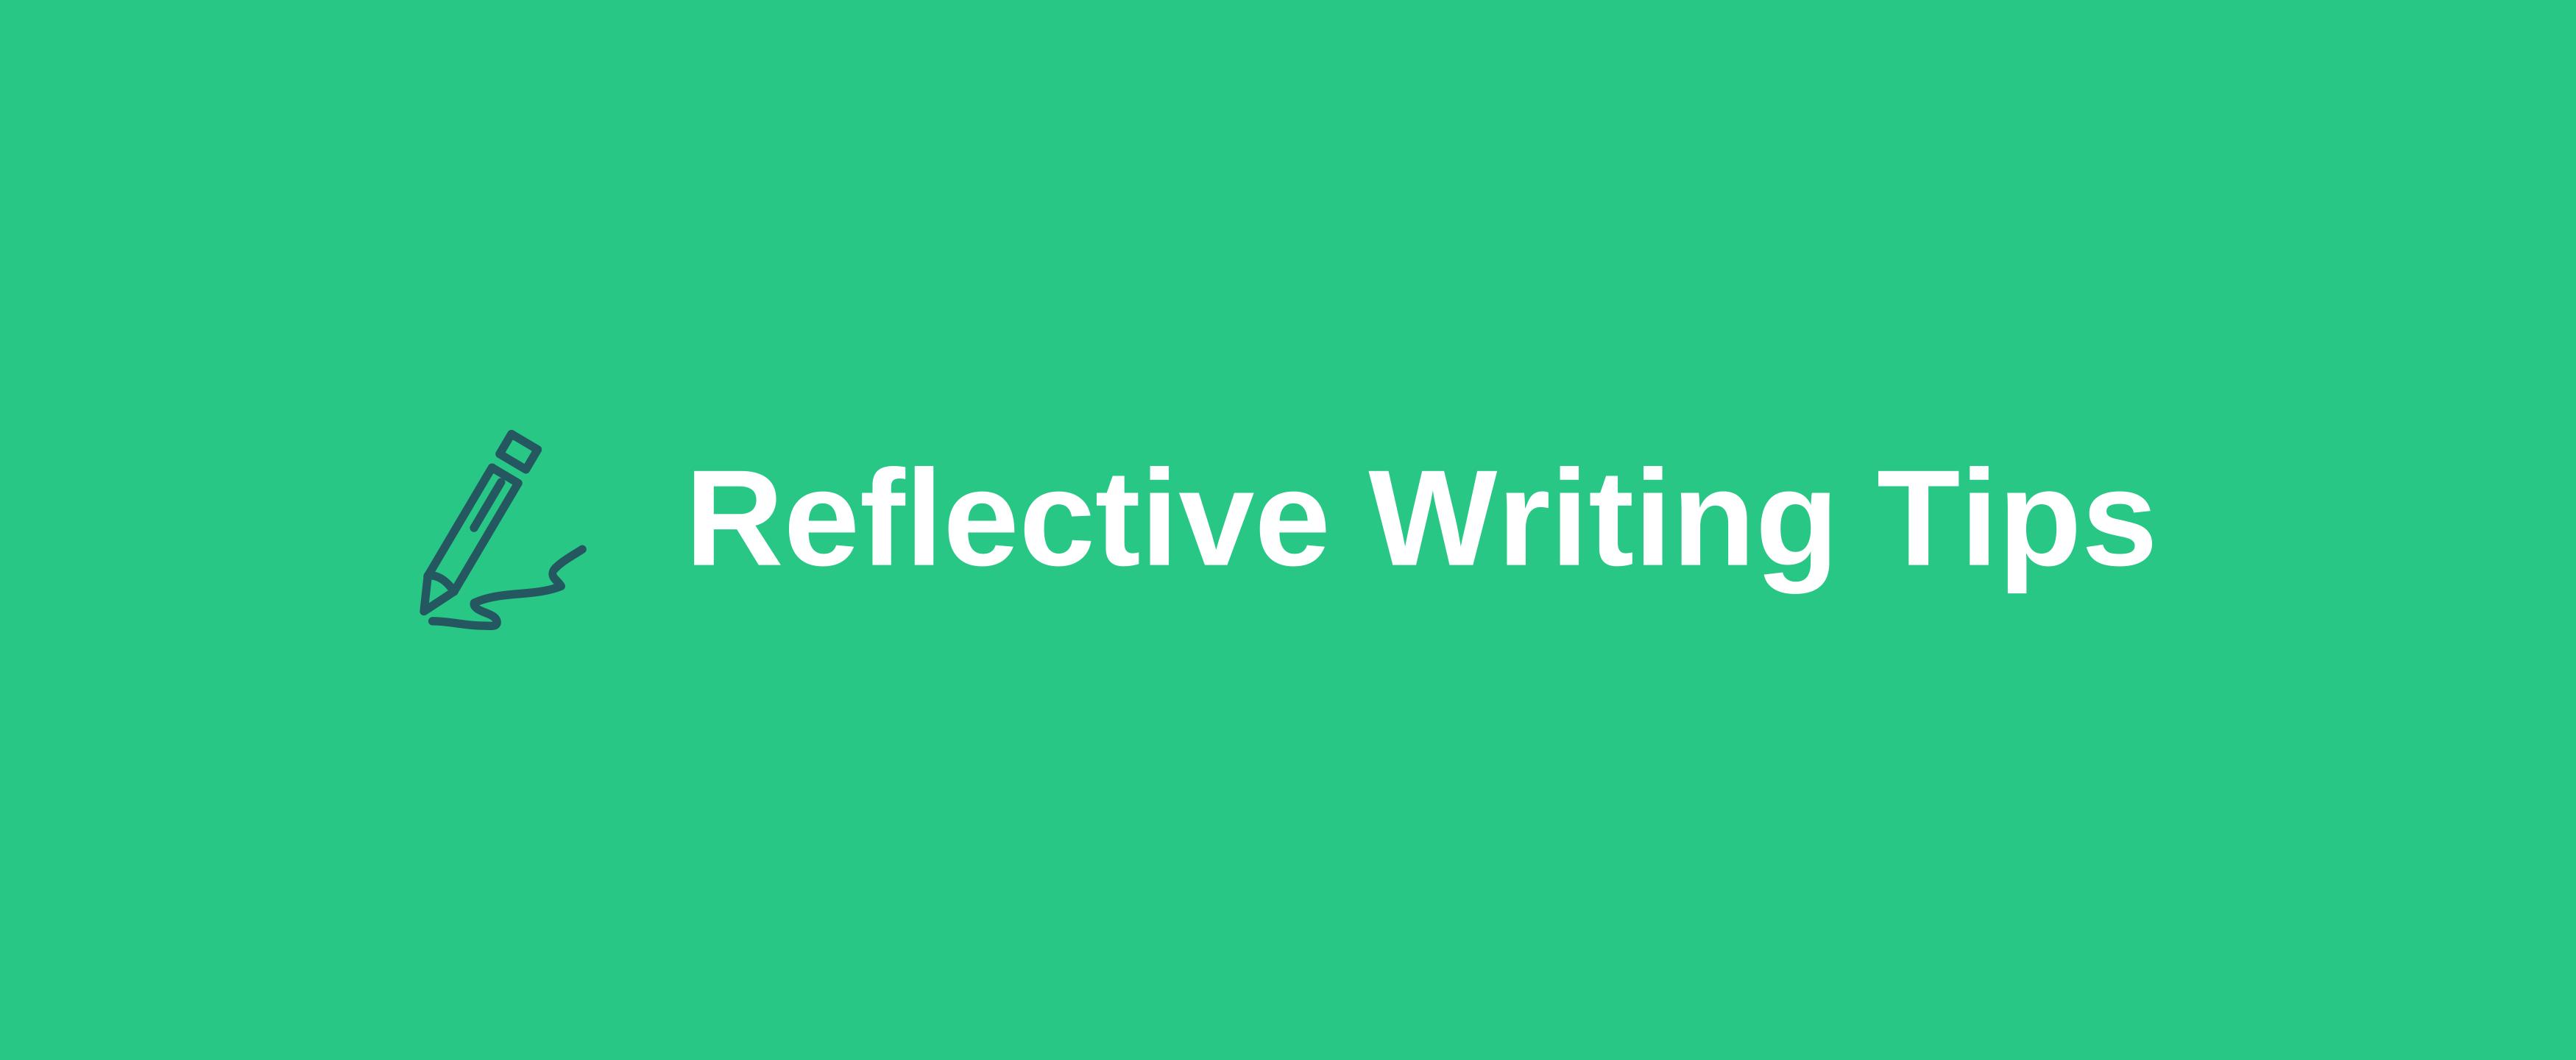 Reflective Writing Tips